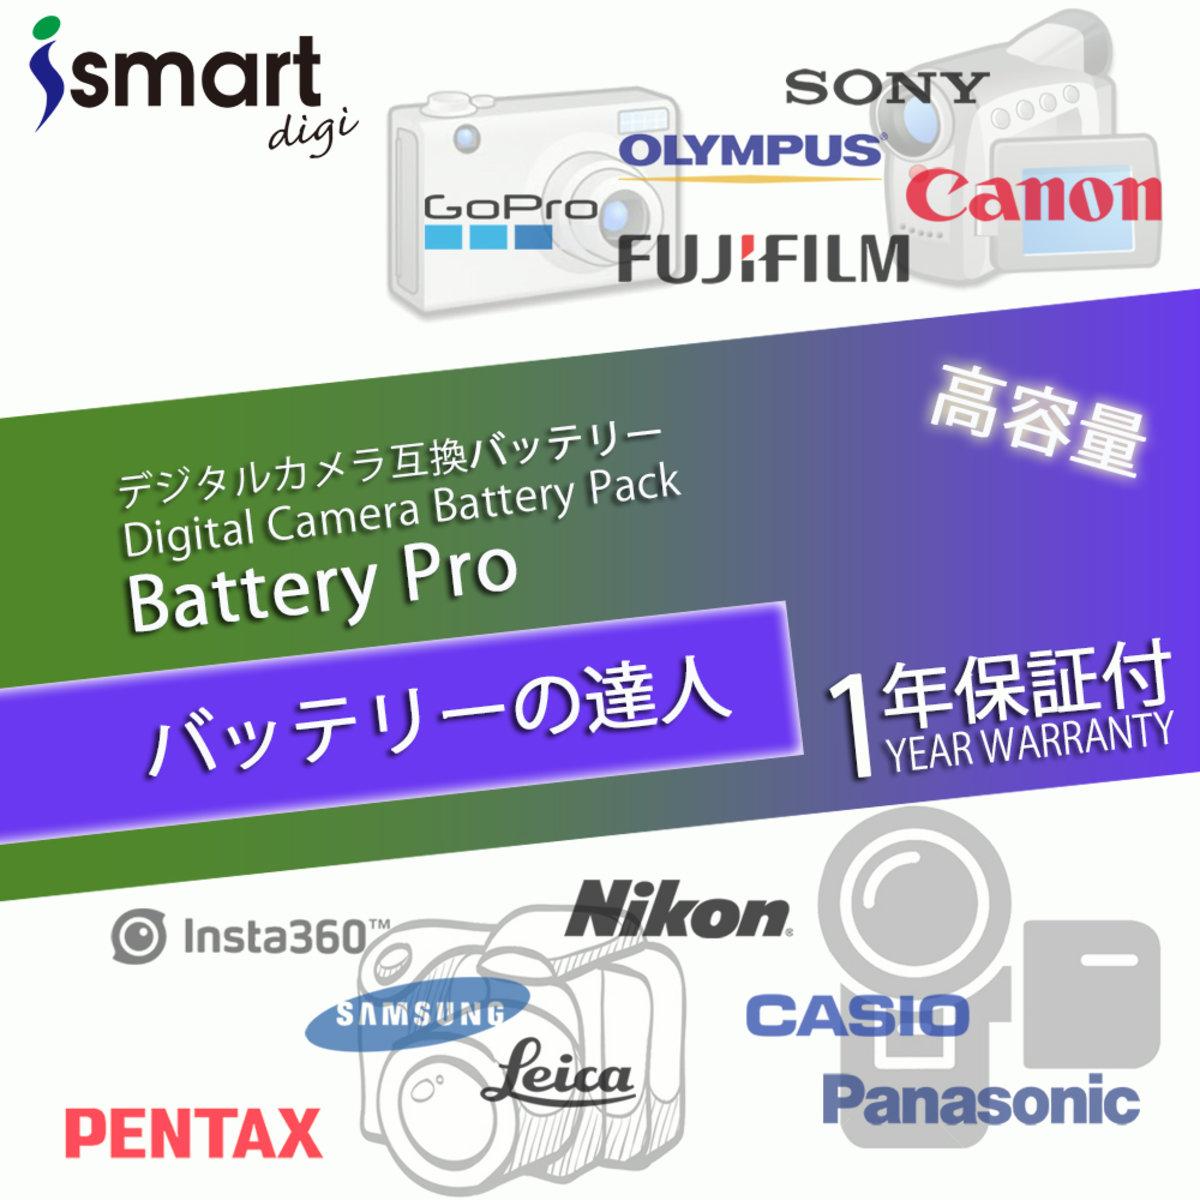 Panasonic Digital Camera Battery (For:Lumix DMC-FX01EG, Lumix DMC-FX01EG-A, Lumix DMC-FX01EG-K, Lumix DMC-FX01EG-S)